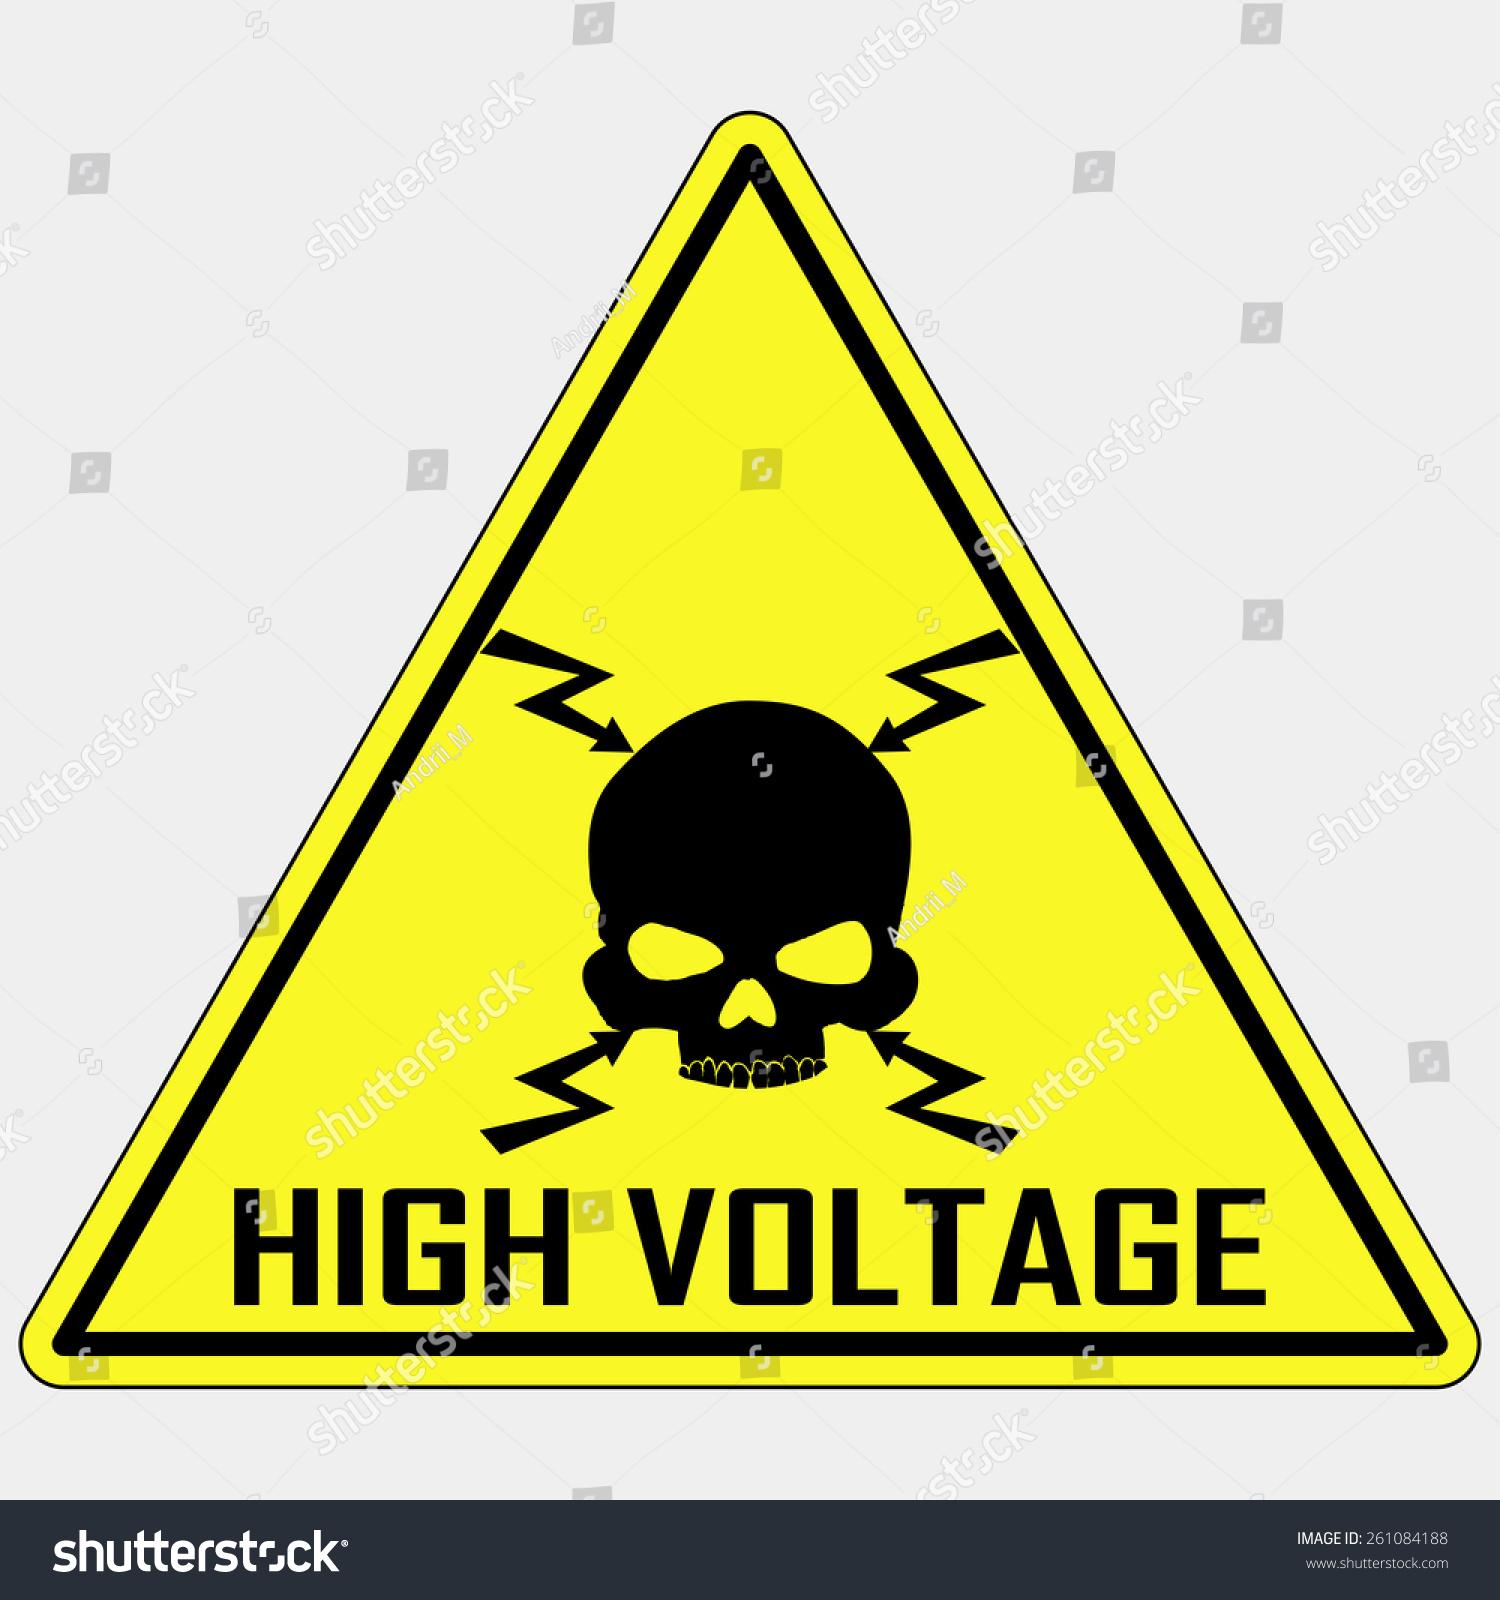 pics for gt electrical danger symbol